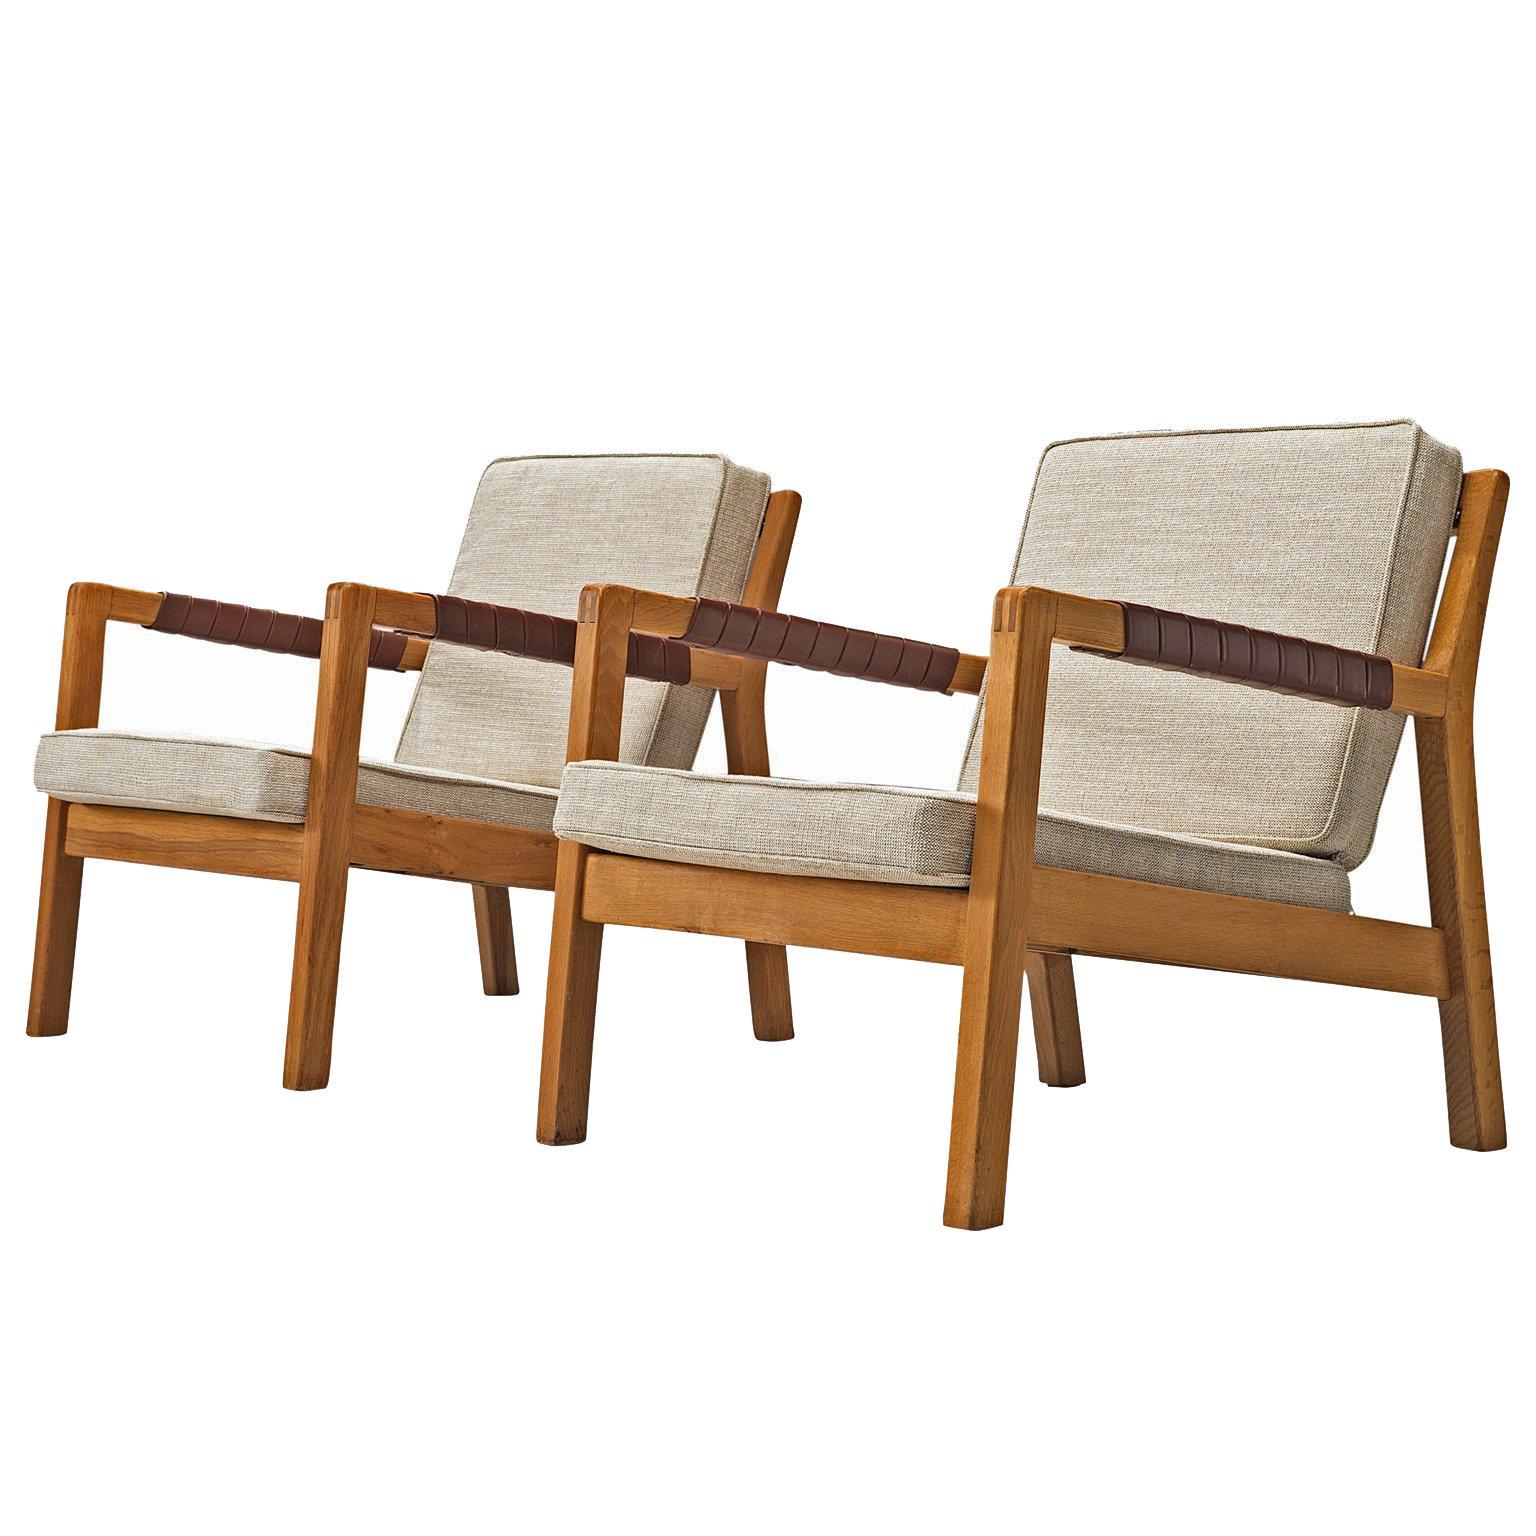 Surprising Carl Gustaf Hiort Of Ornas Oak Rialto Lounge Chairs At 1Stdibs Machost Co Dining Chair Design Ideas Machostcouk